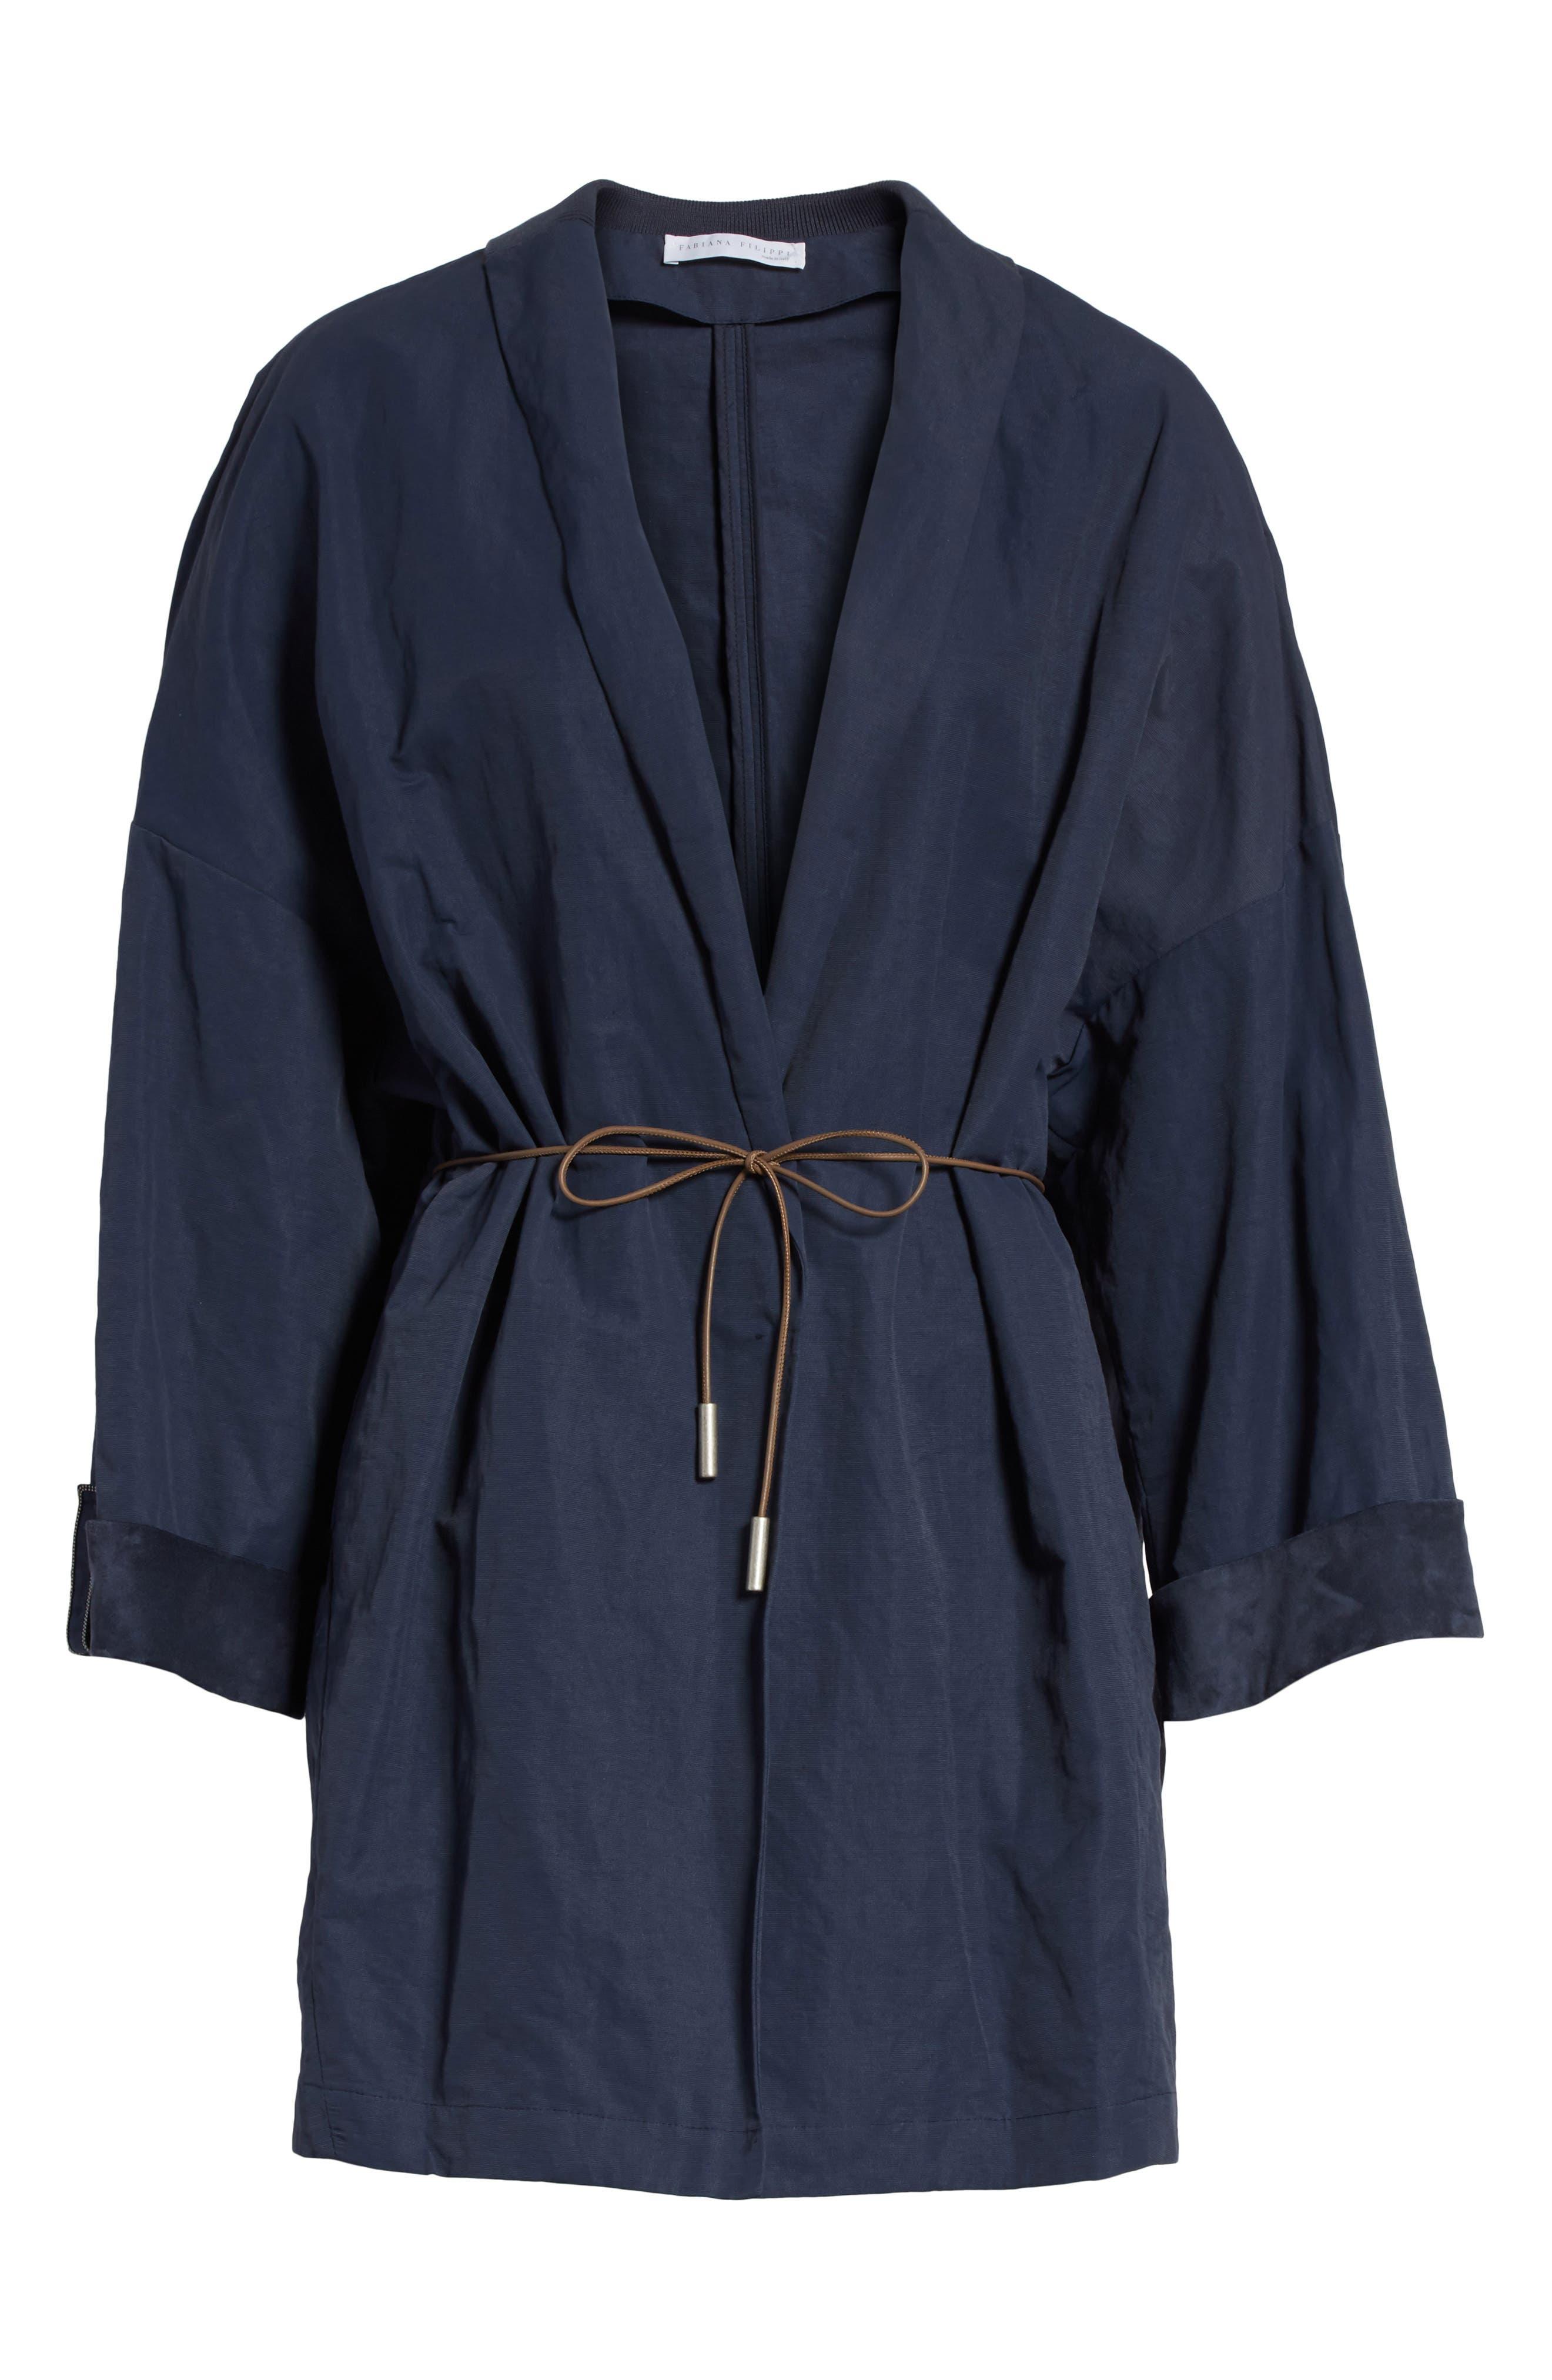 Suede & Cotton Blend Kimono Jacket,                             Alternate thumbnail 7, color,                             Navy